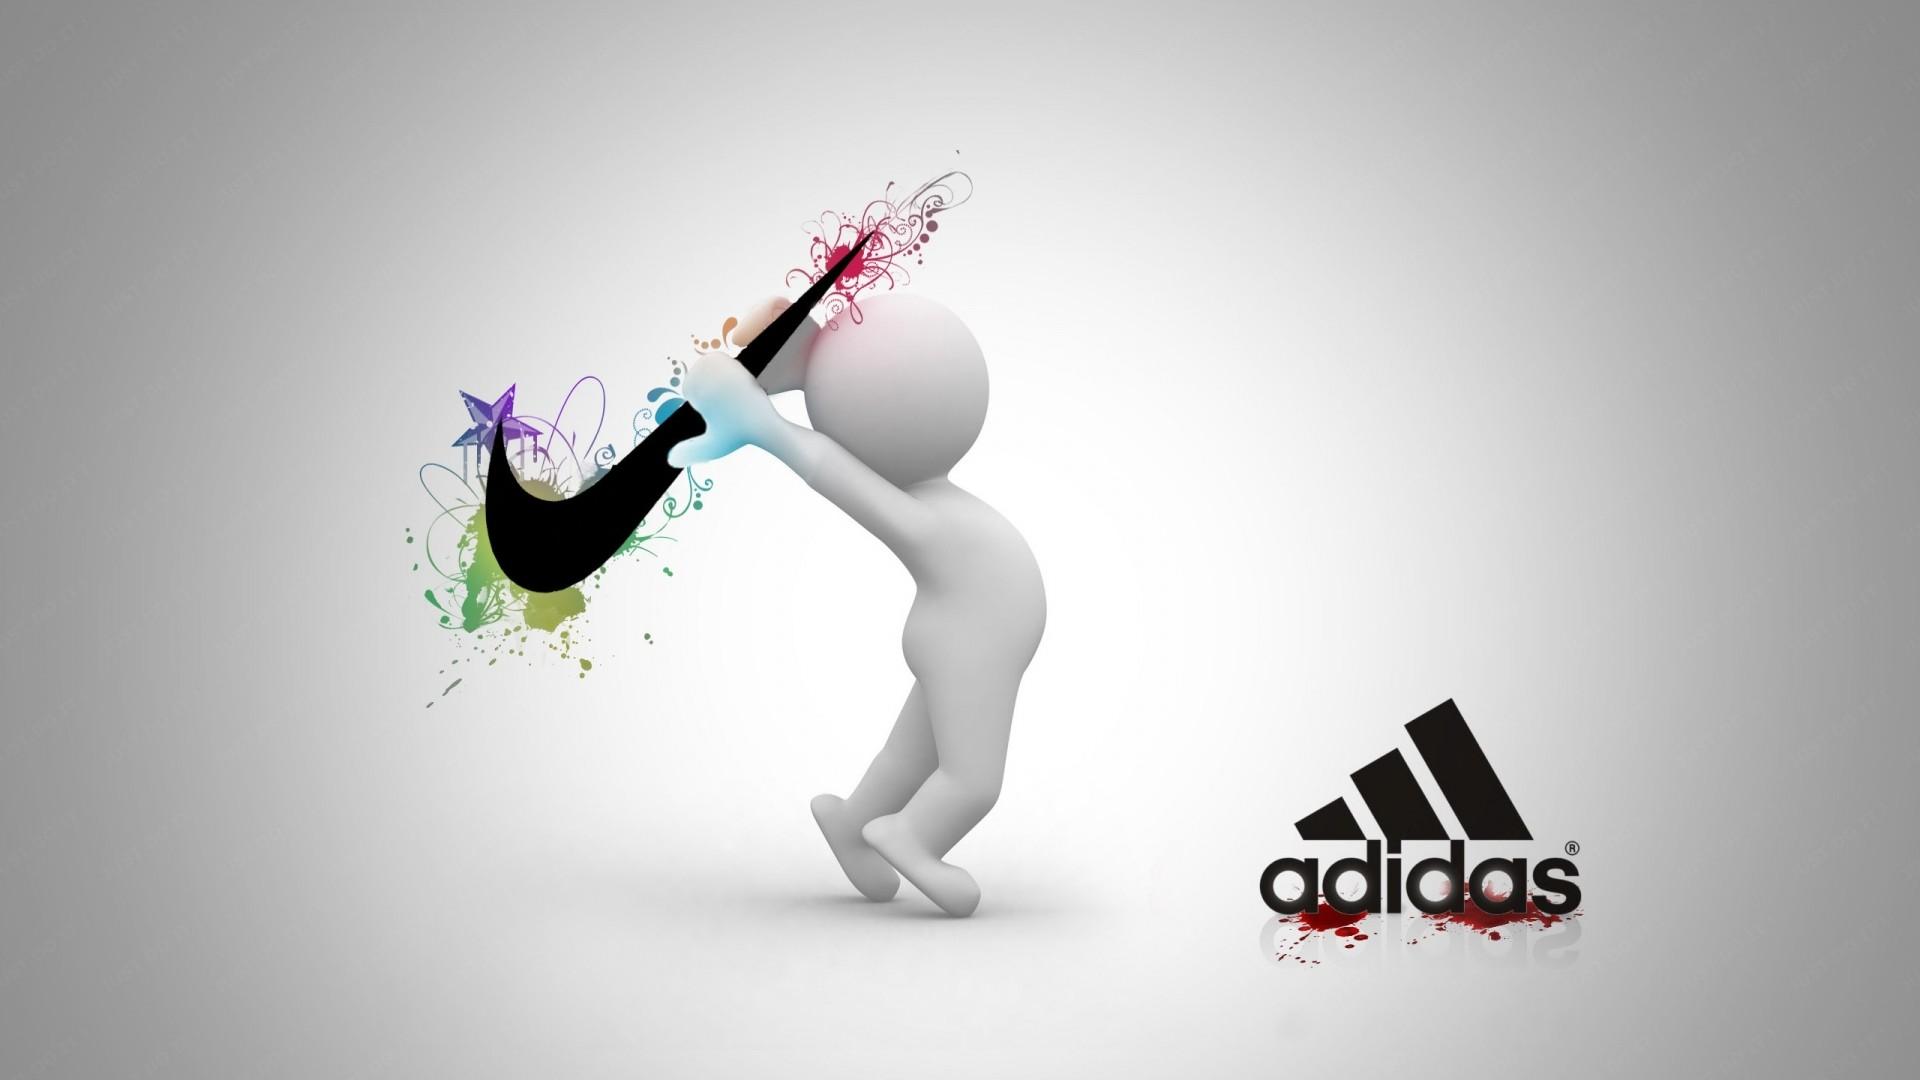 Nike HD Wallpapers Backgrounds Wallpaper 1600×900 Nike Wallpaper Hd (44  Wallpapers) |